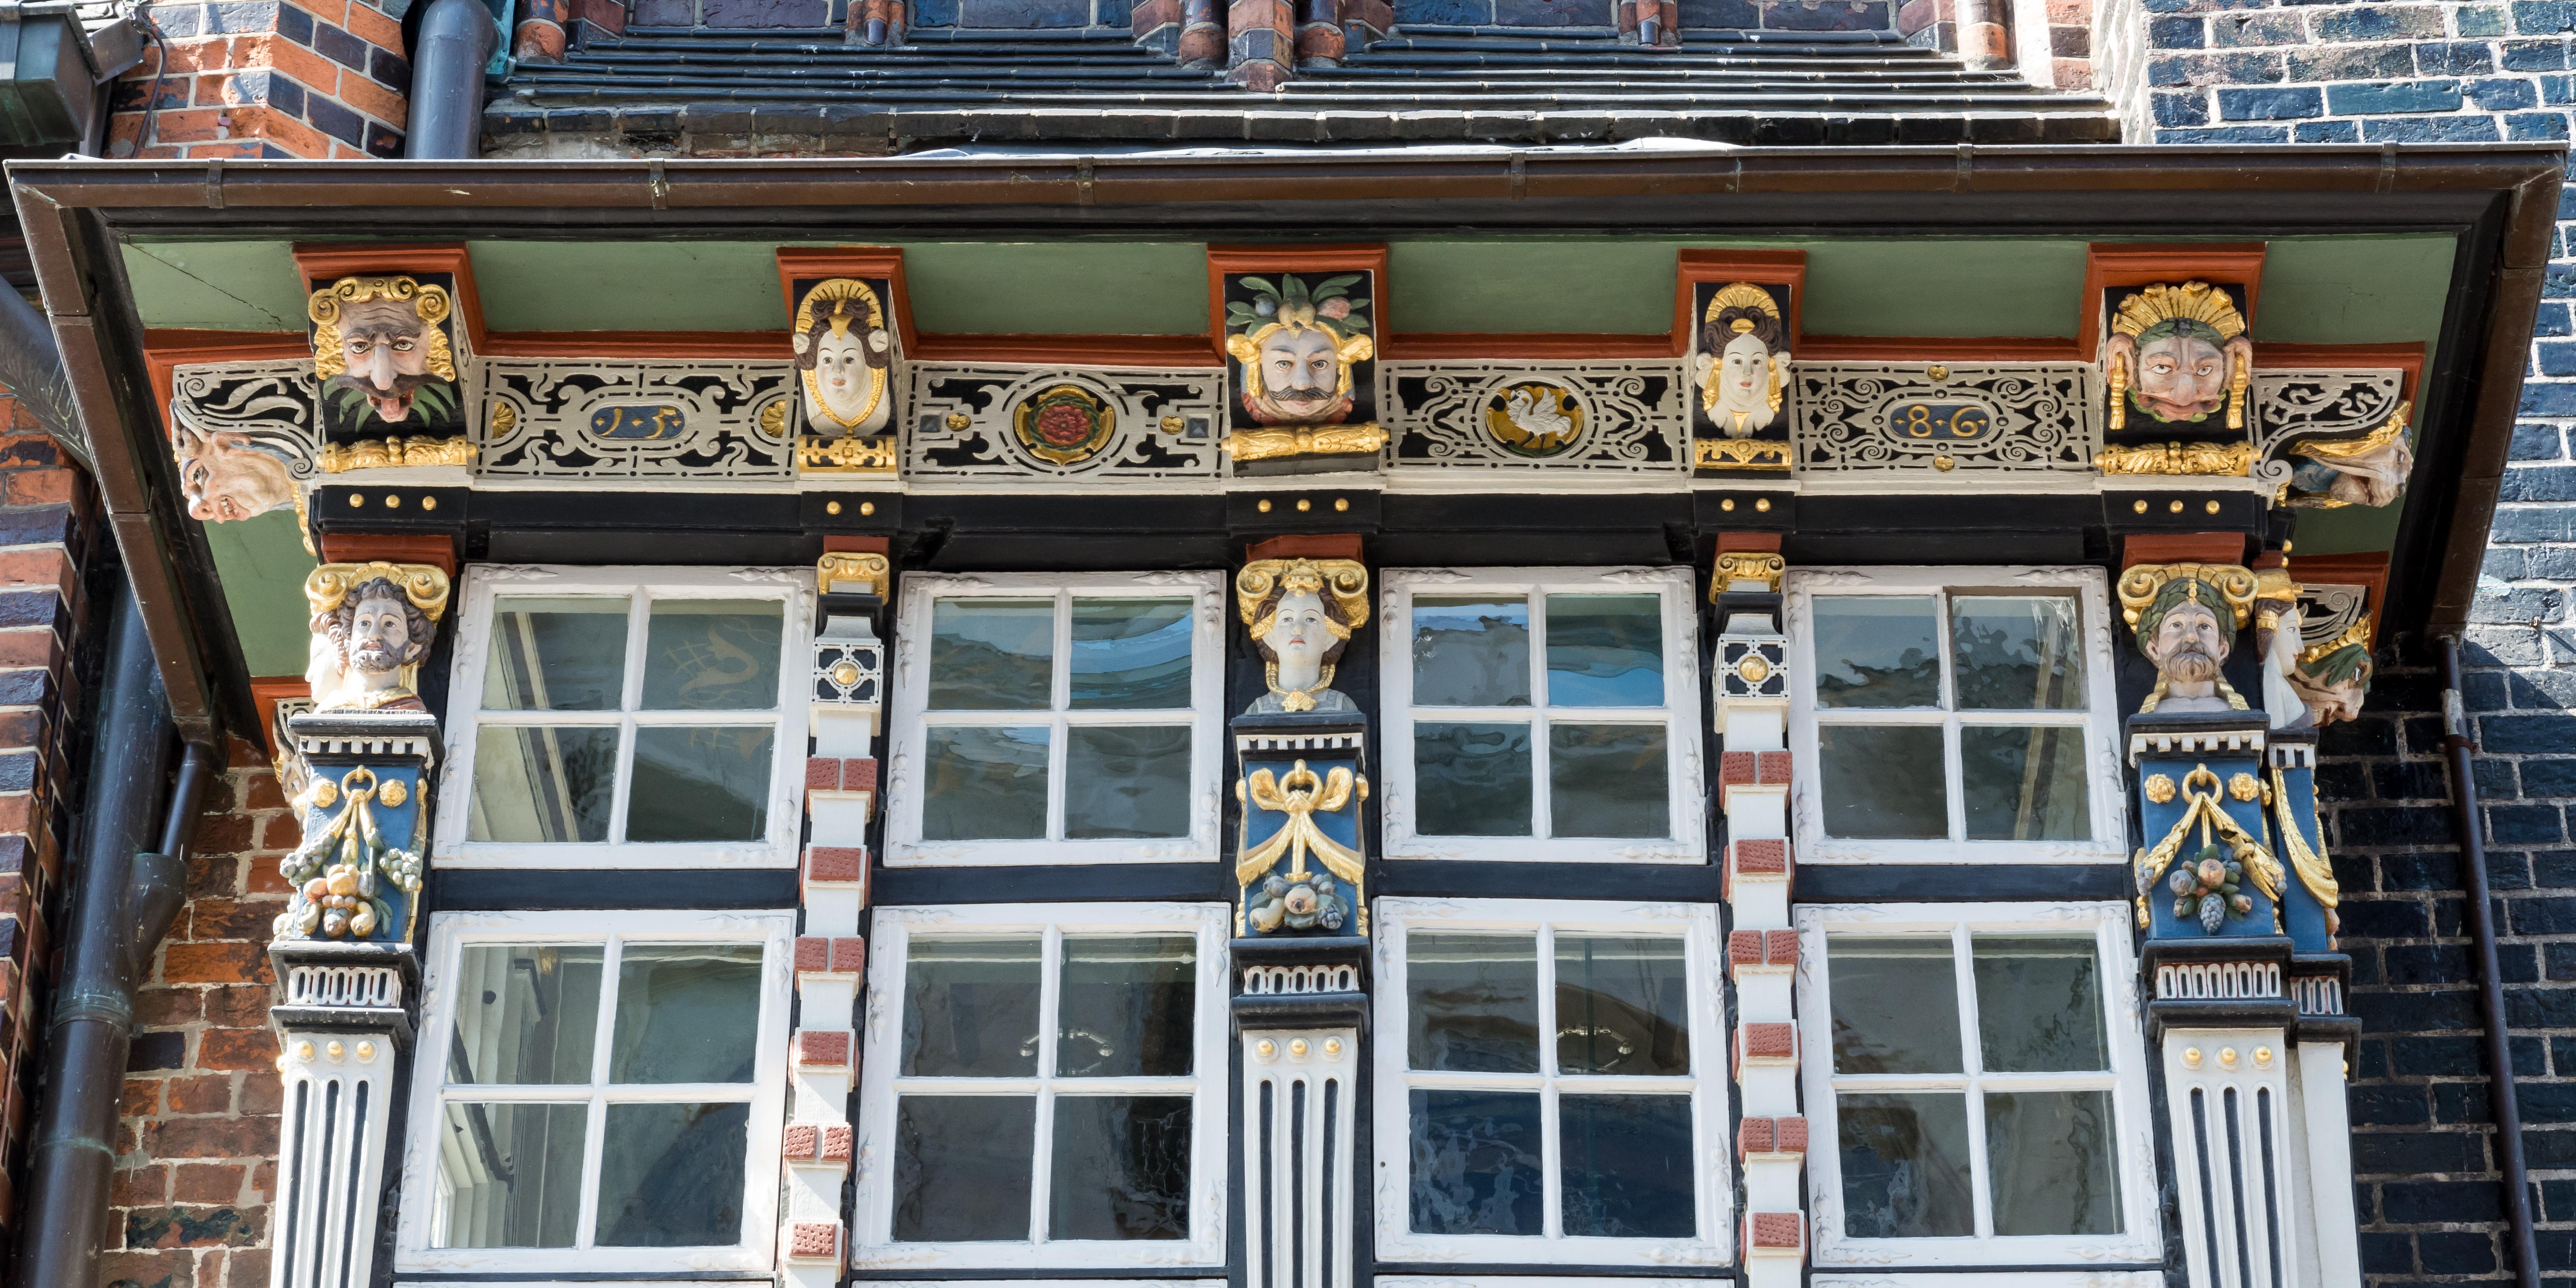 Datei:Rathaus (Lübeck-Altstadt).Erker.2.159.ajb.jpg – Wikipedia